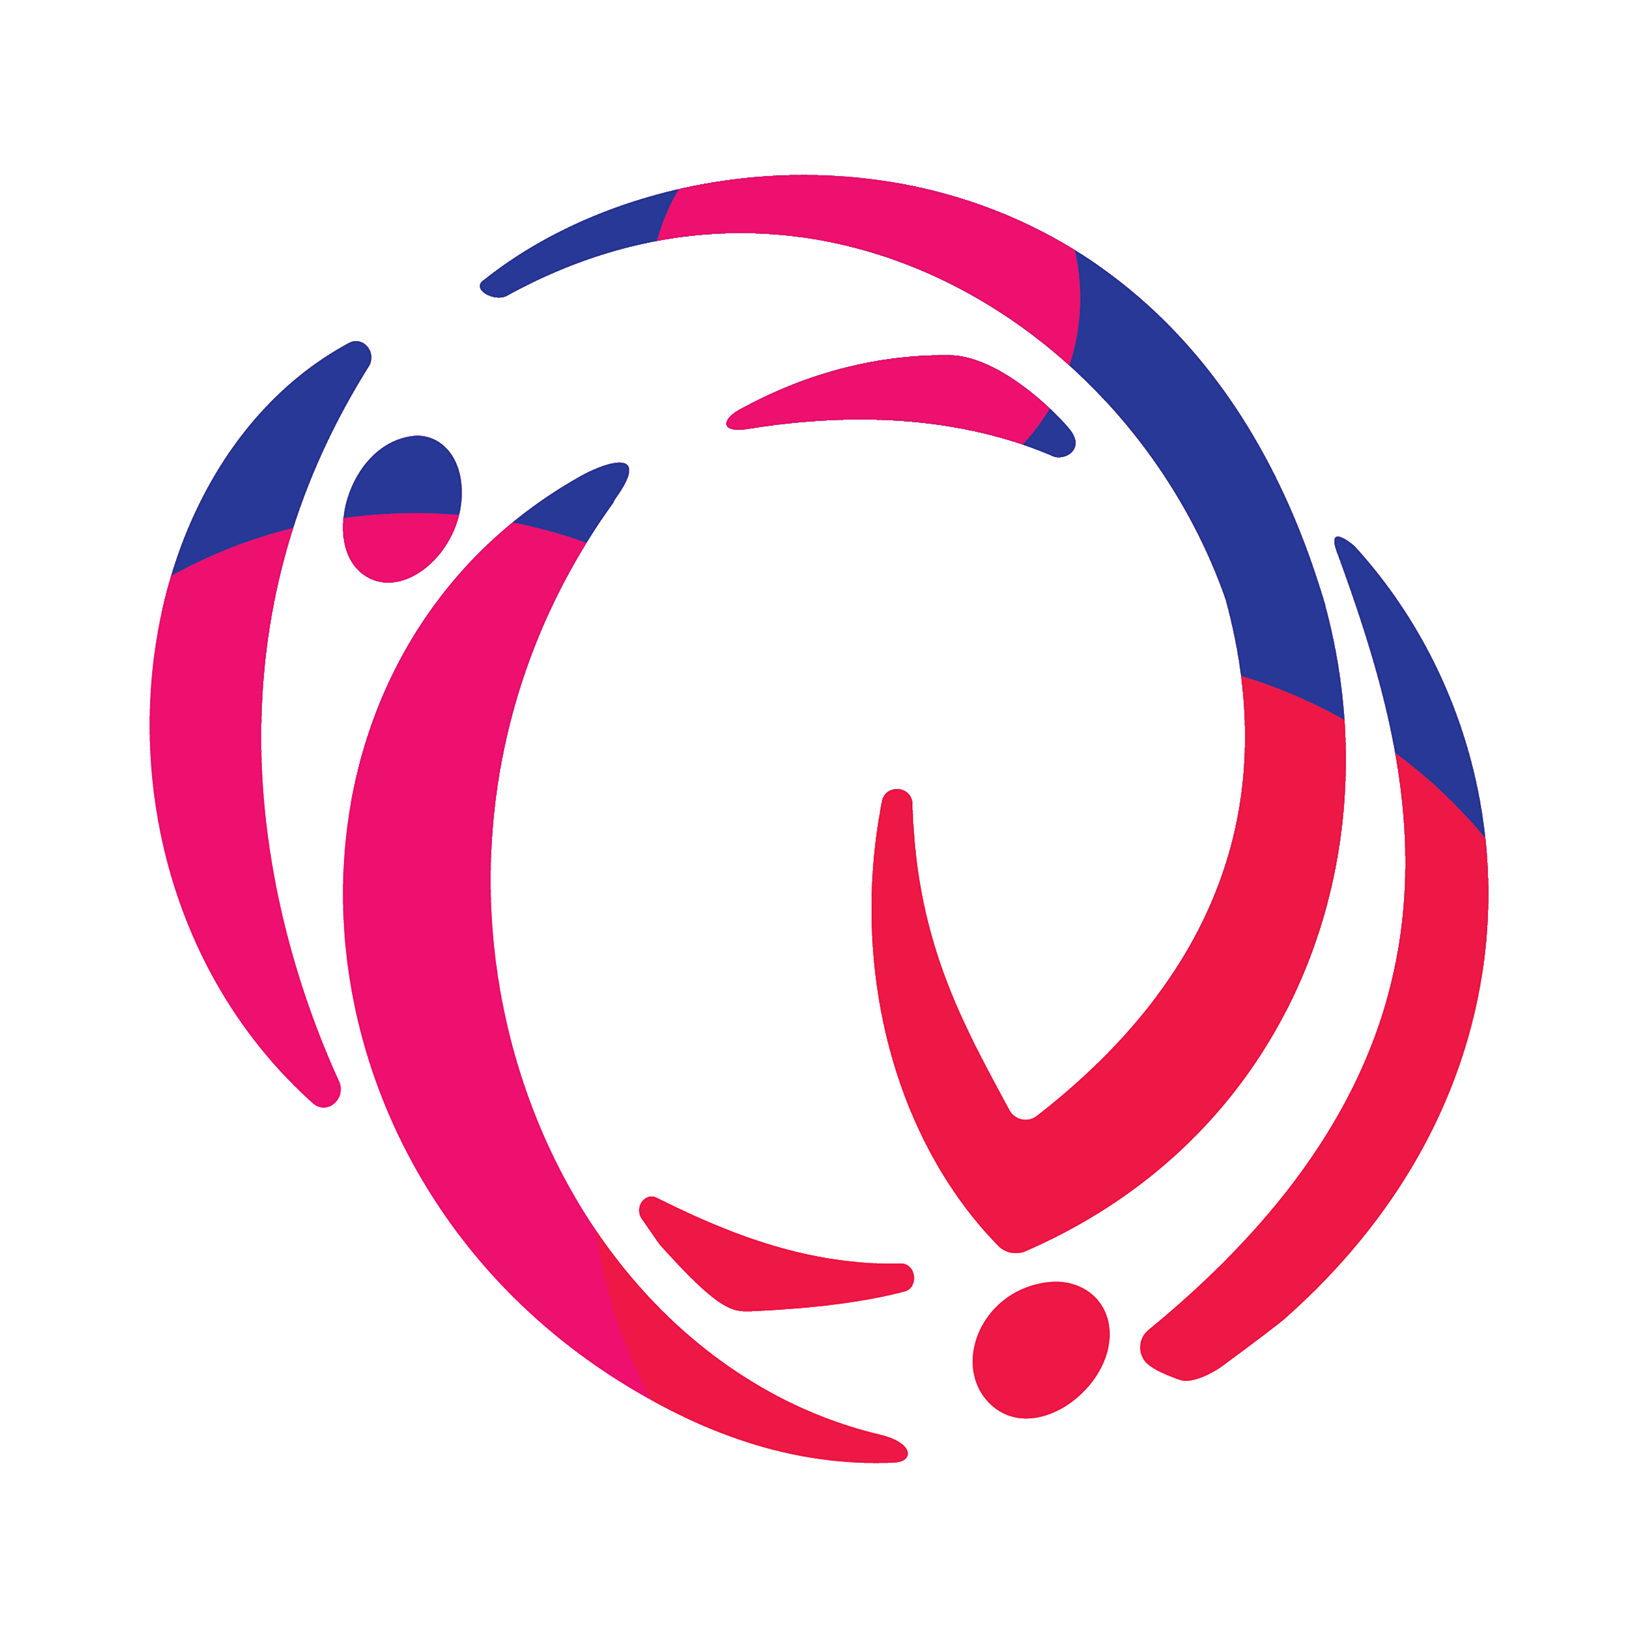 2012 European Artistic Gymnastics Championships - Men